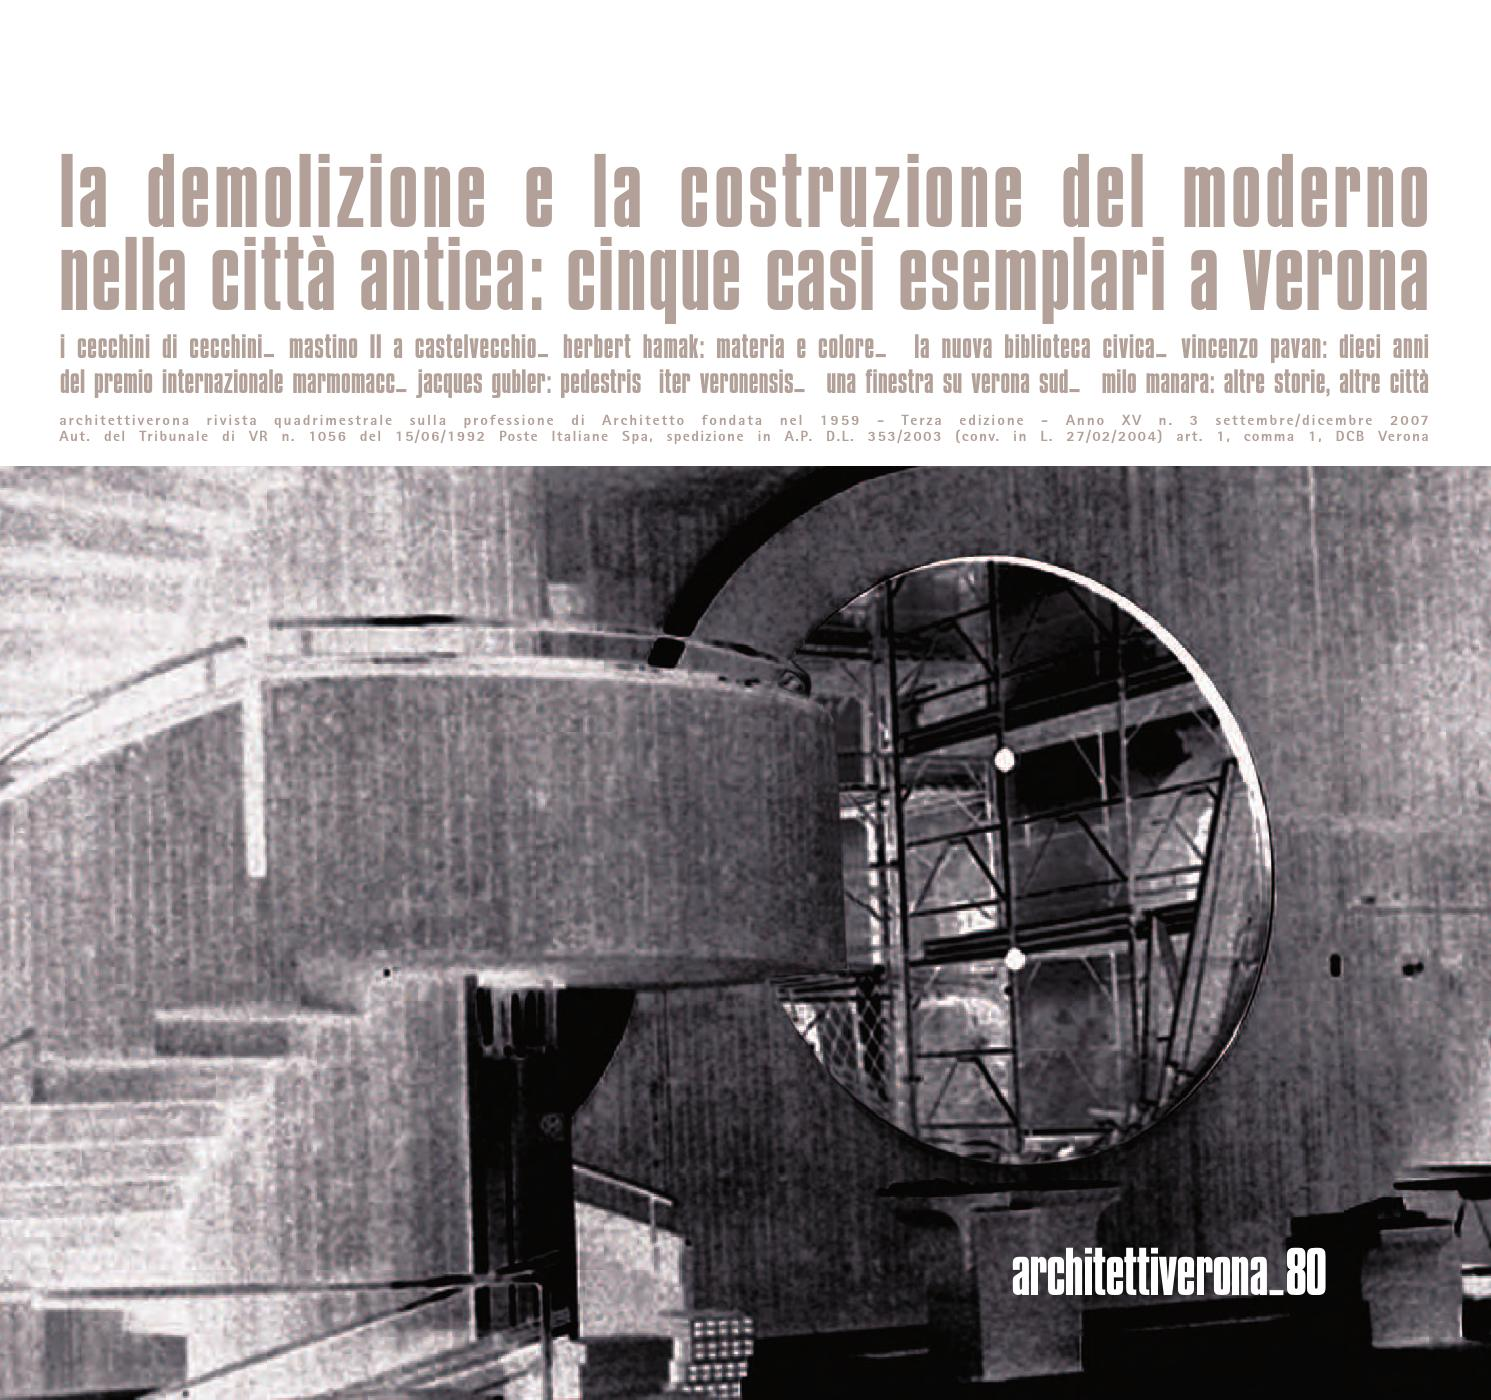 Architettiverona 80 by architettiverona - issuu 6e07ffadc3f